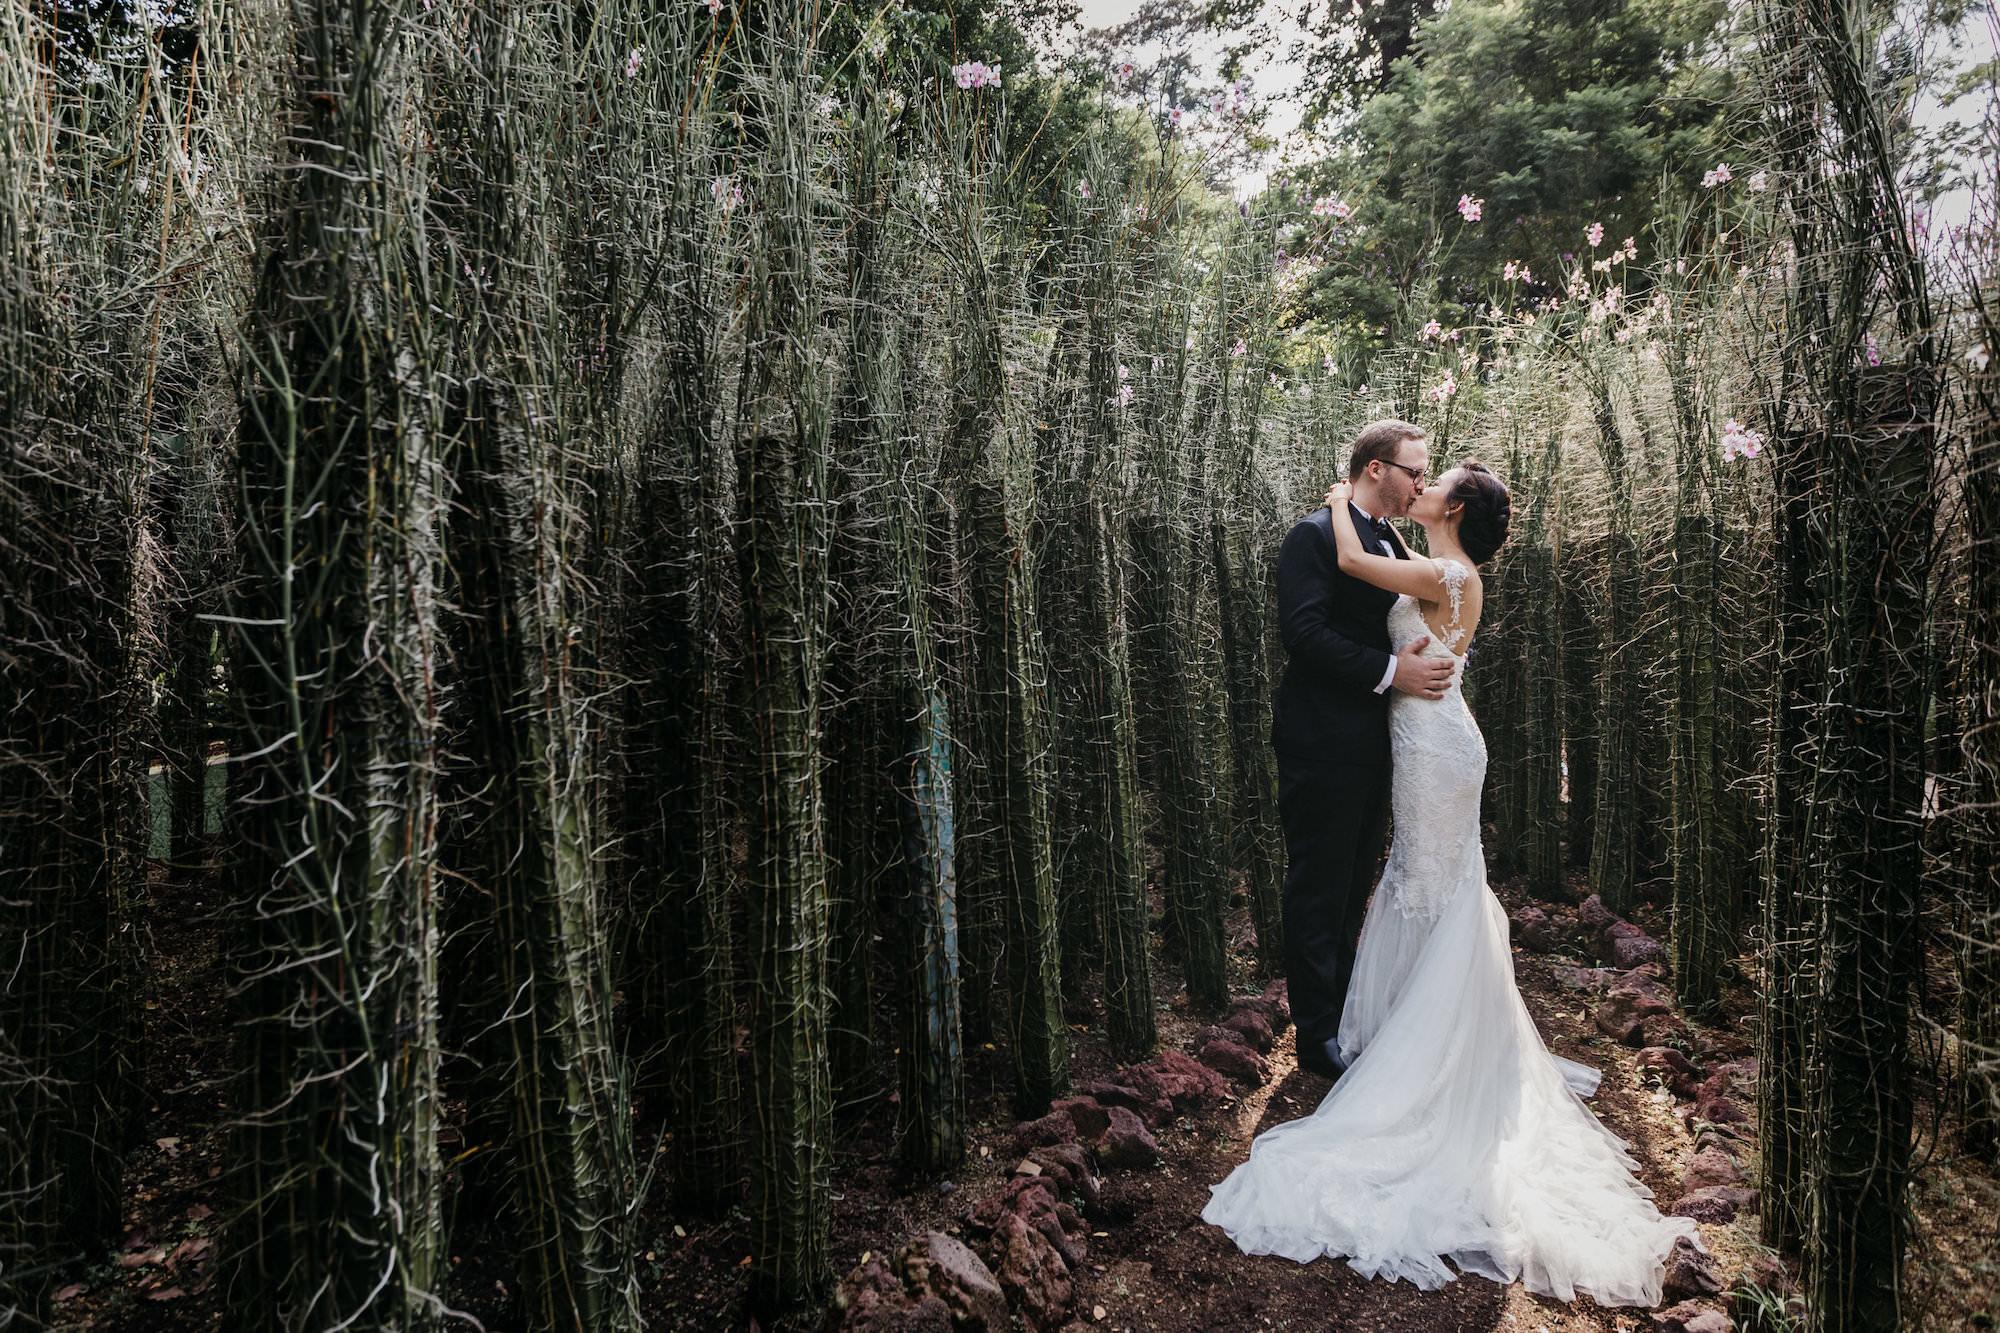 Sui & Nic - Singapore Wedding Photography 2.jpg